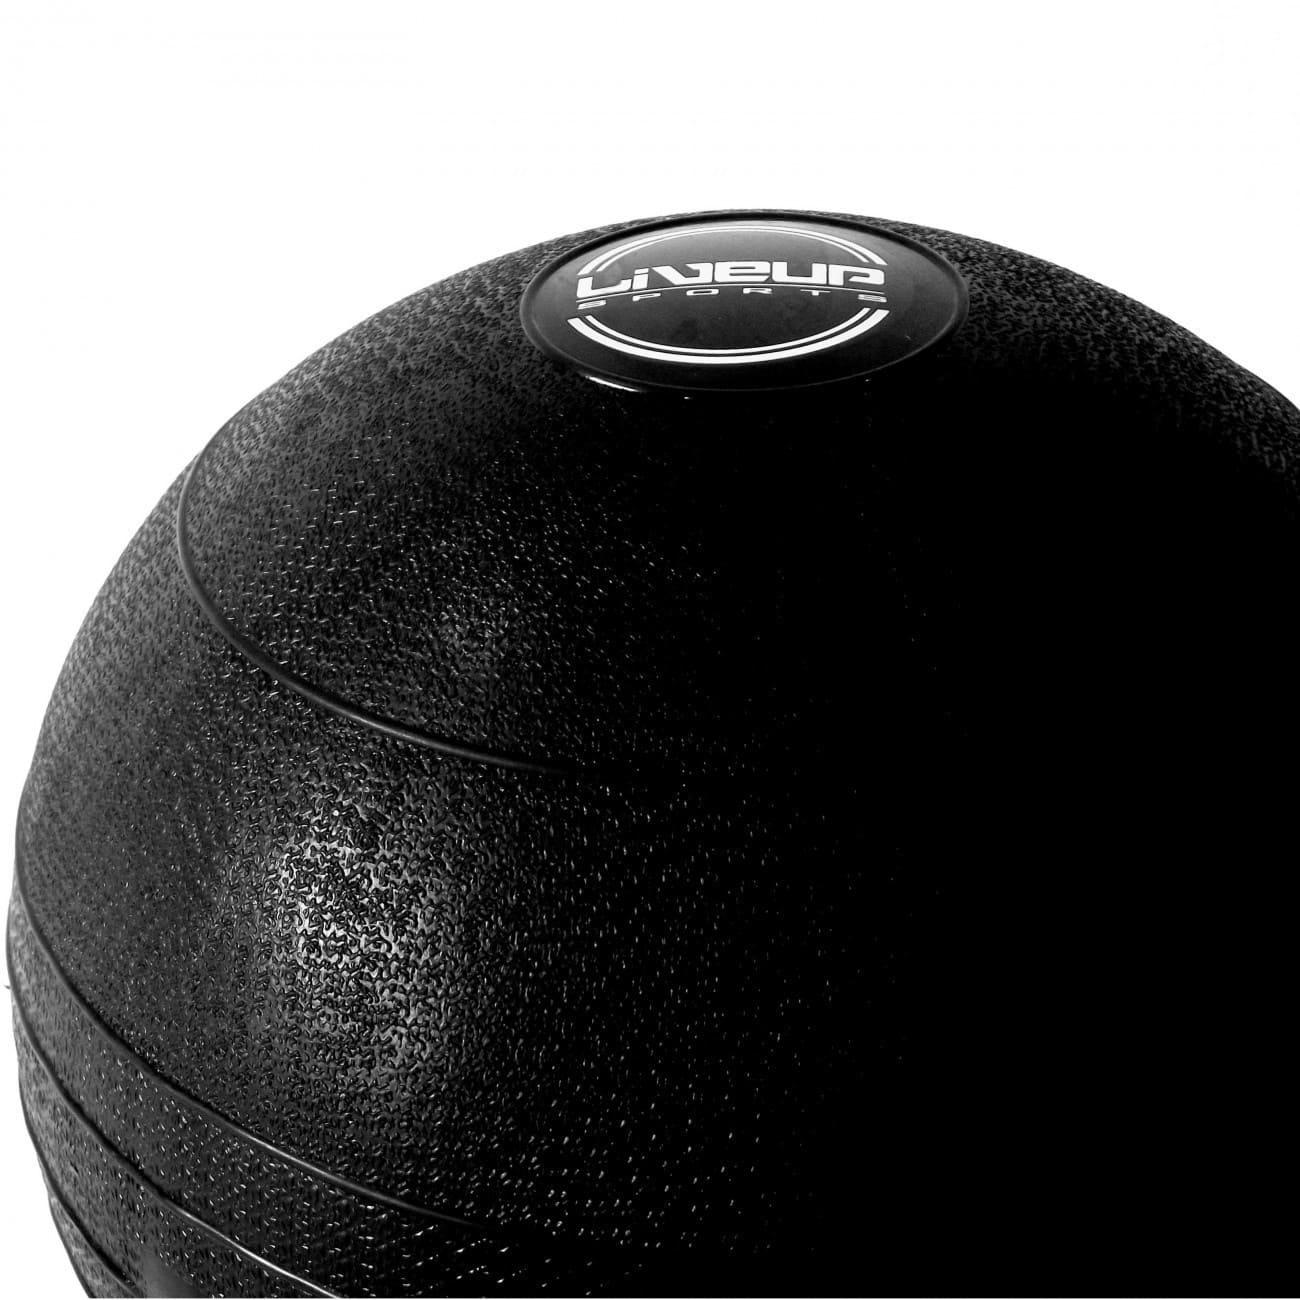 SLAM BALL E - 12KG - LIVEUP SPORTS